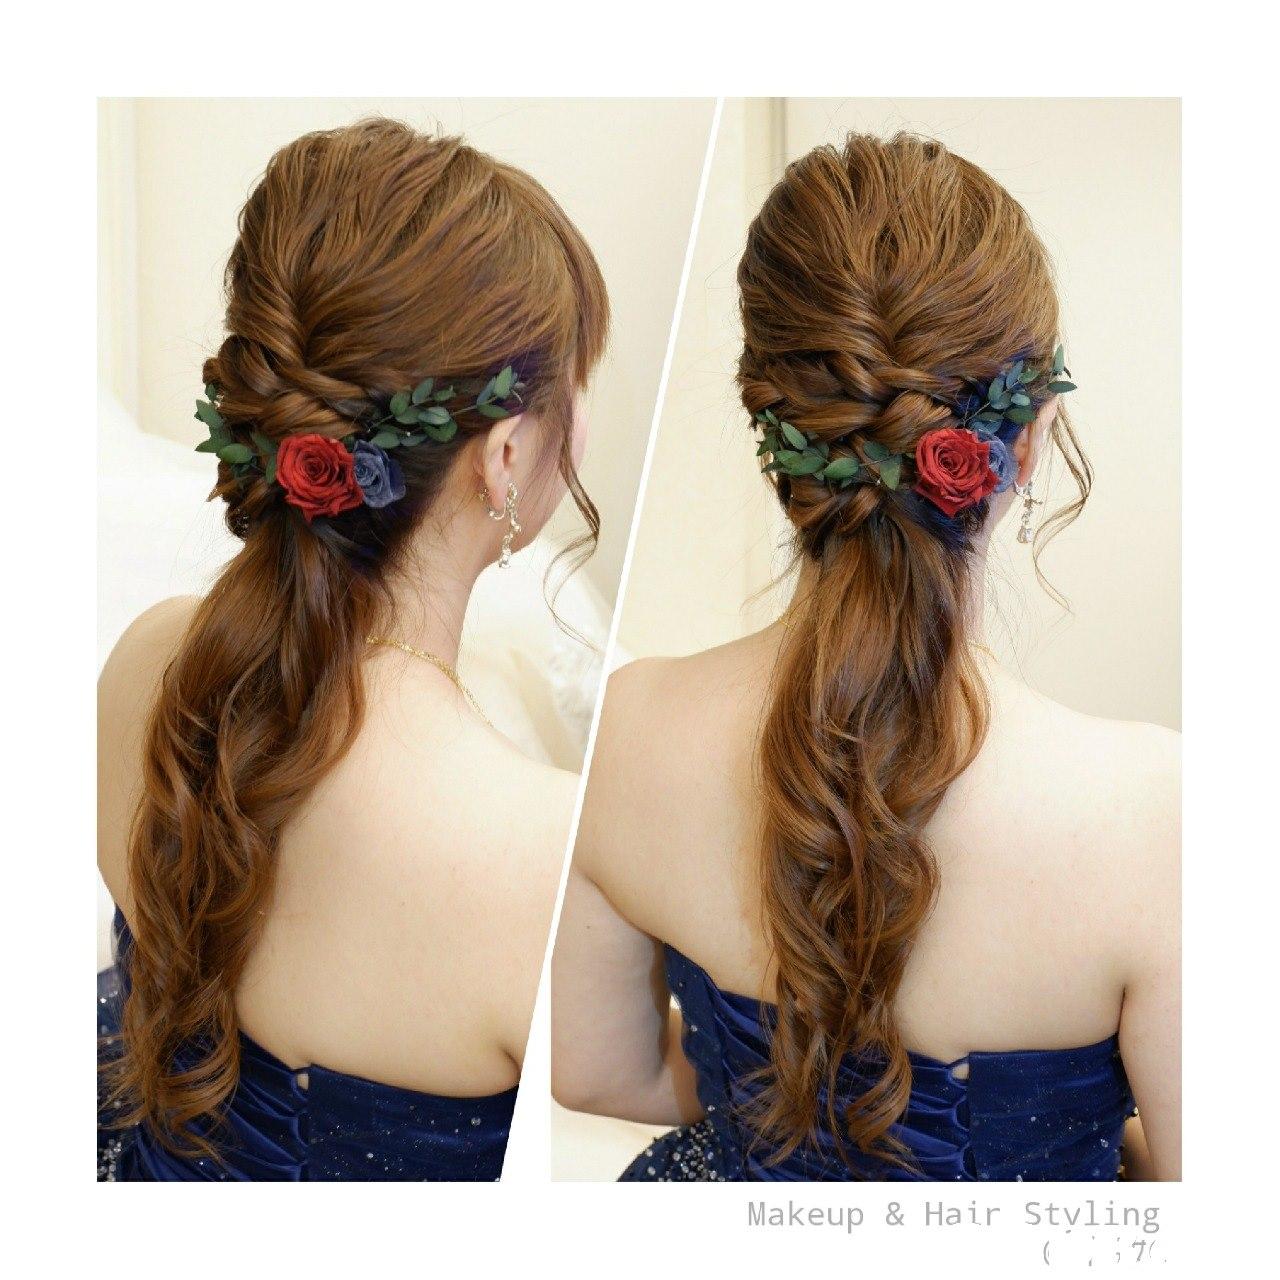 Makeup & Hair Styling  hair